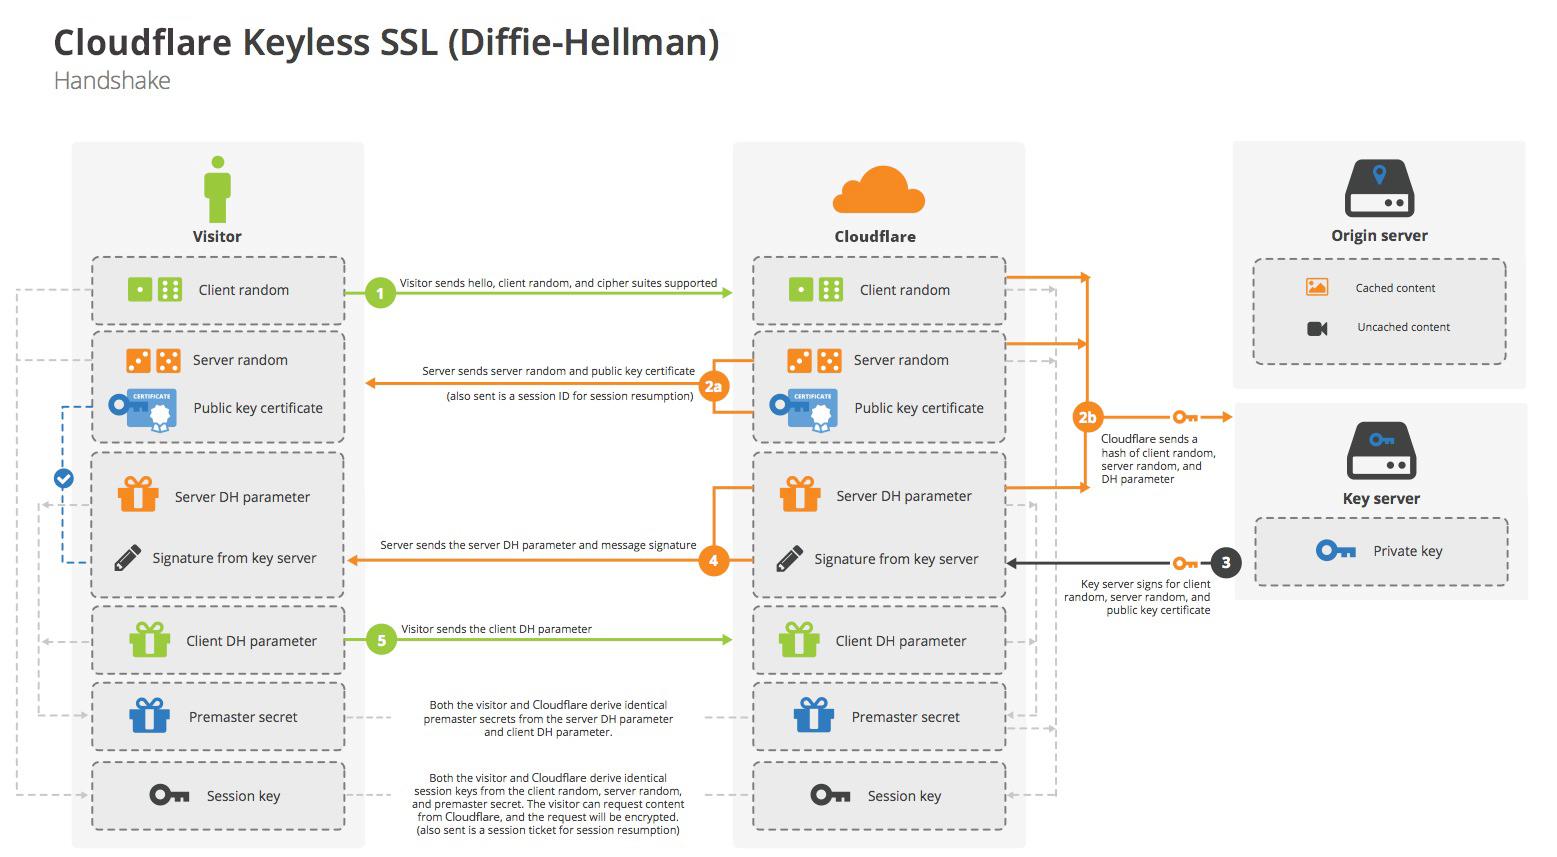 Cloudflare Keyless SSL (Diffie Hellman)